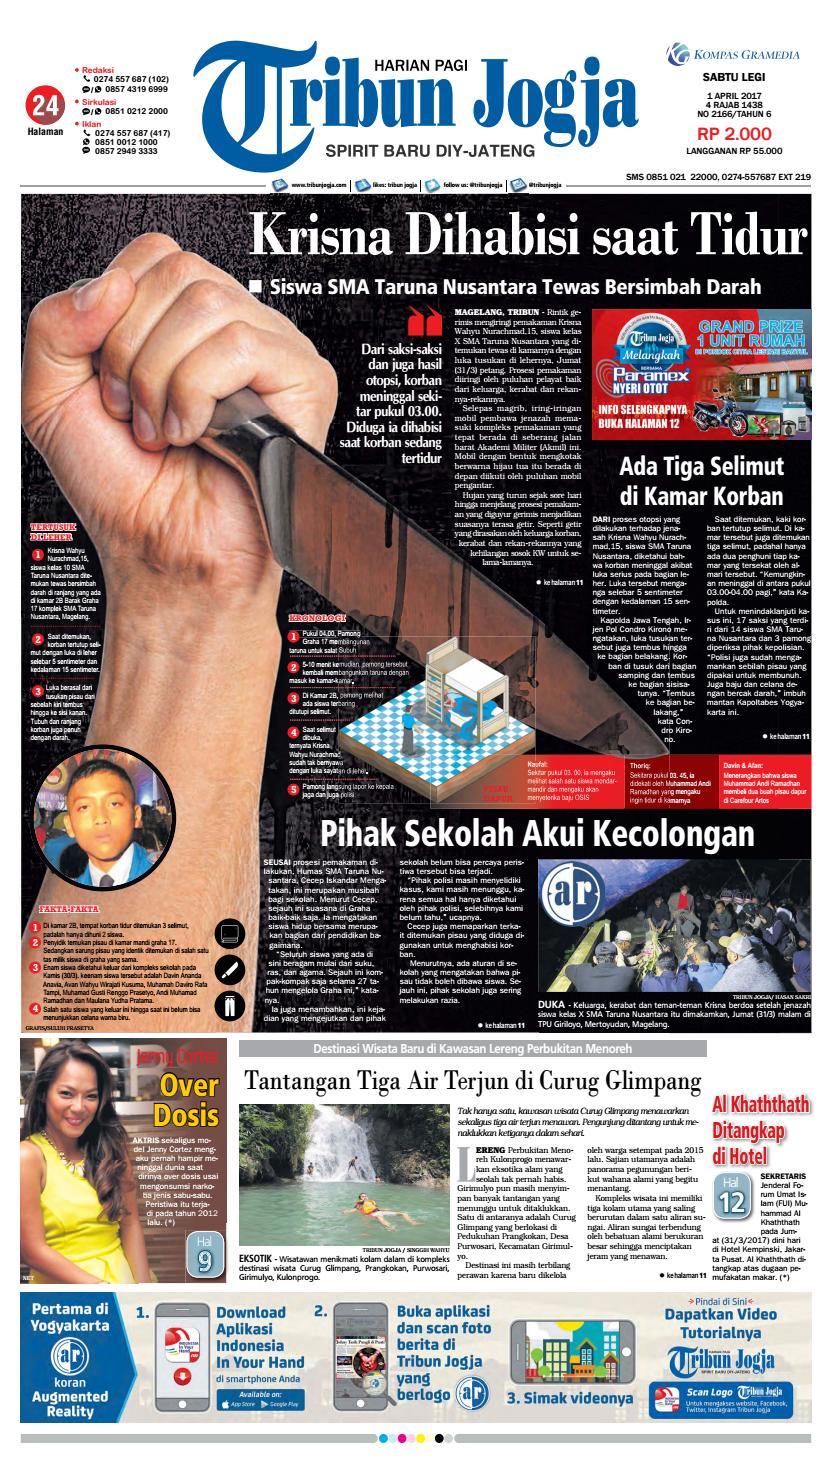 Tribunjogja 01 04 2017 By Tribun Jogja Issuu Snack Gayem Pangsit Bantal Imut Bdg